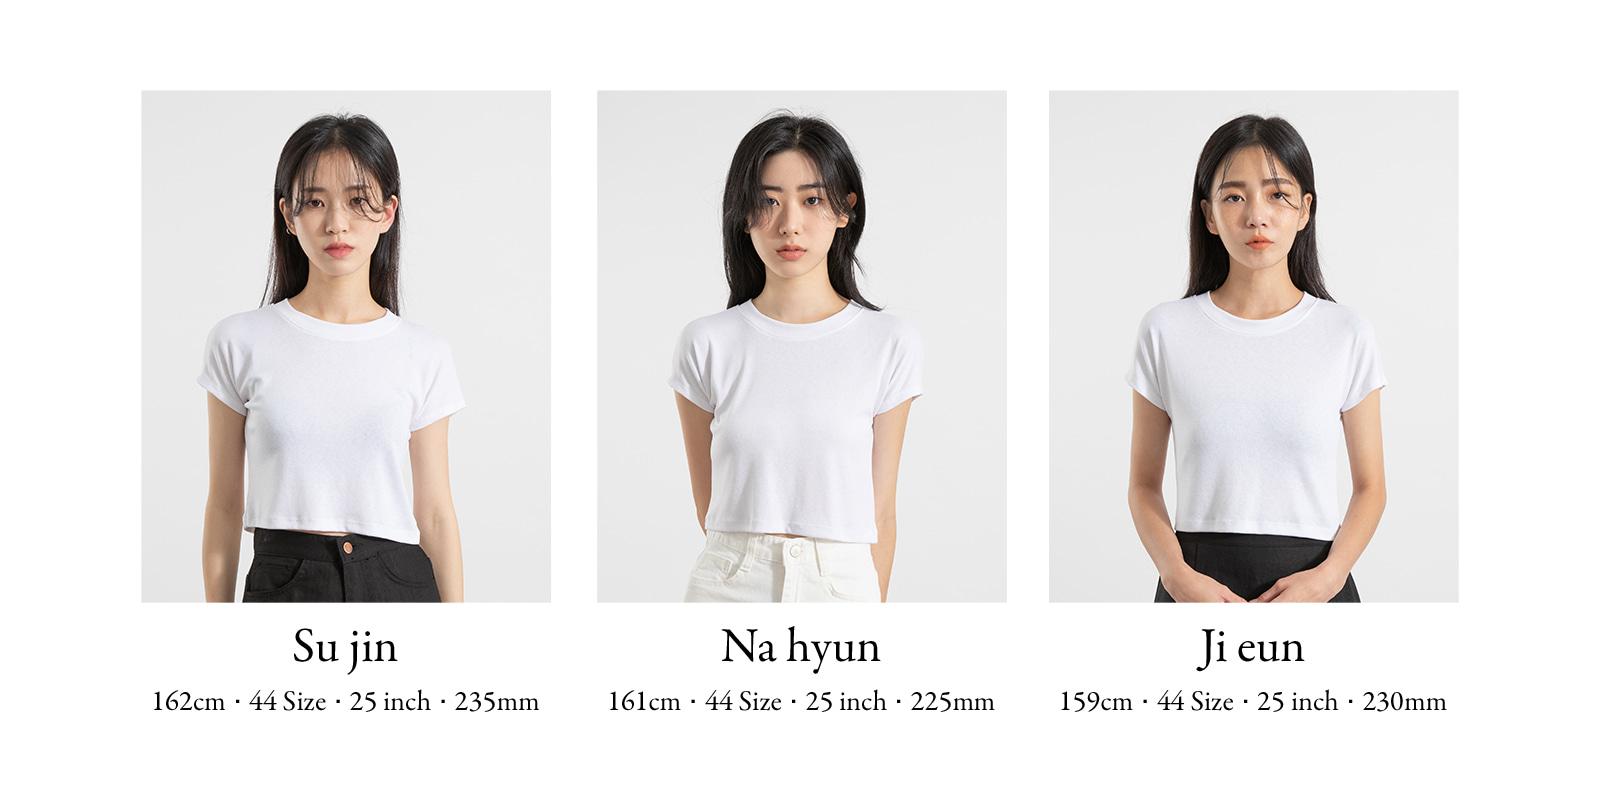 Solid linen button sleeveless top